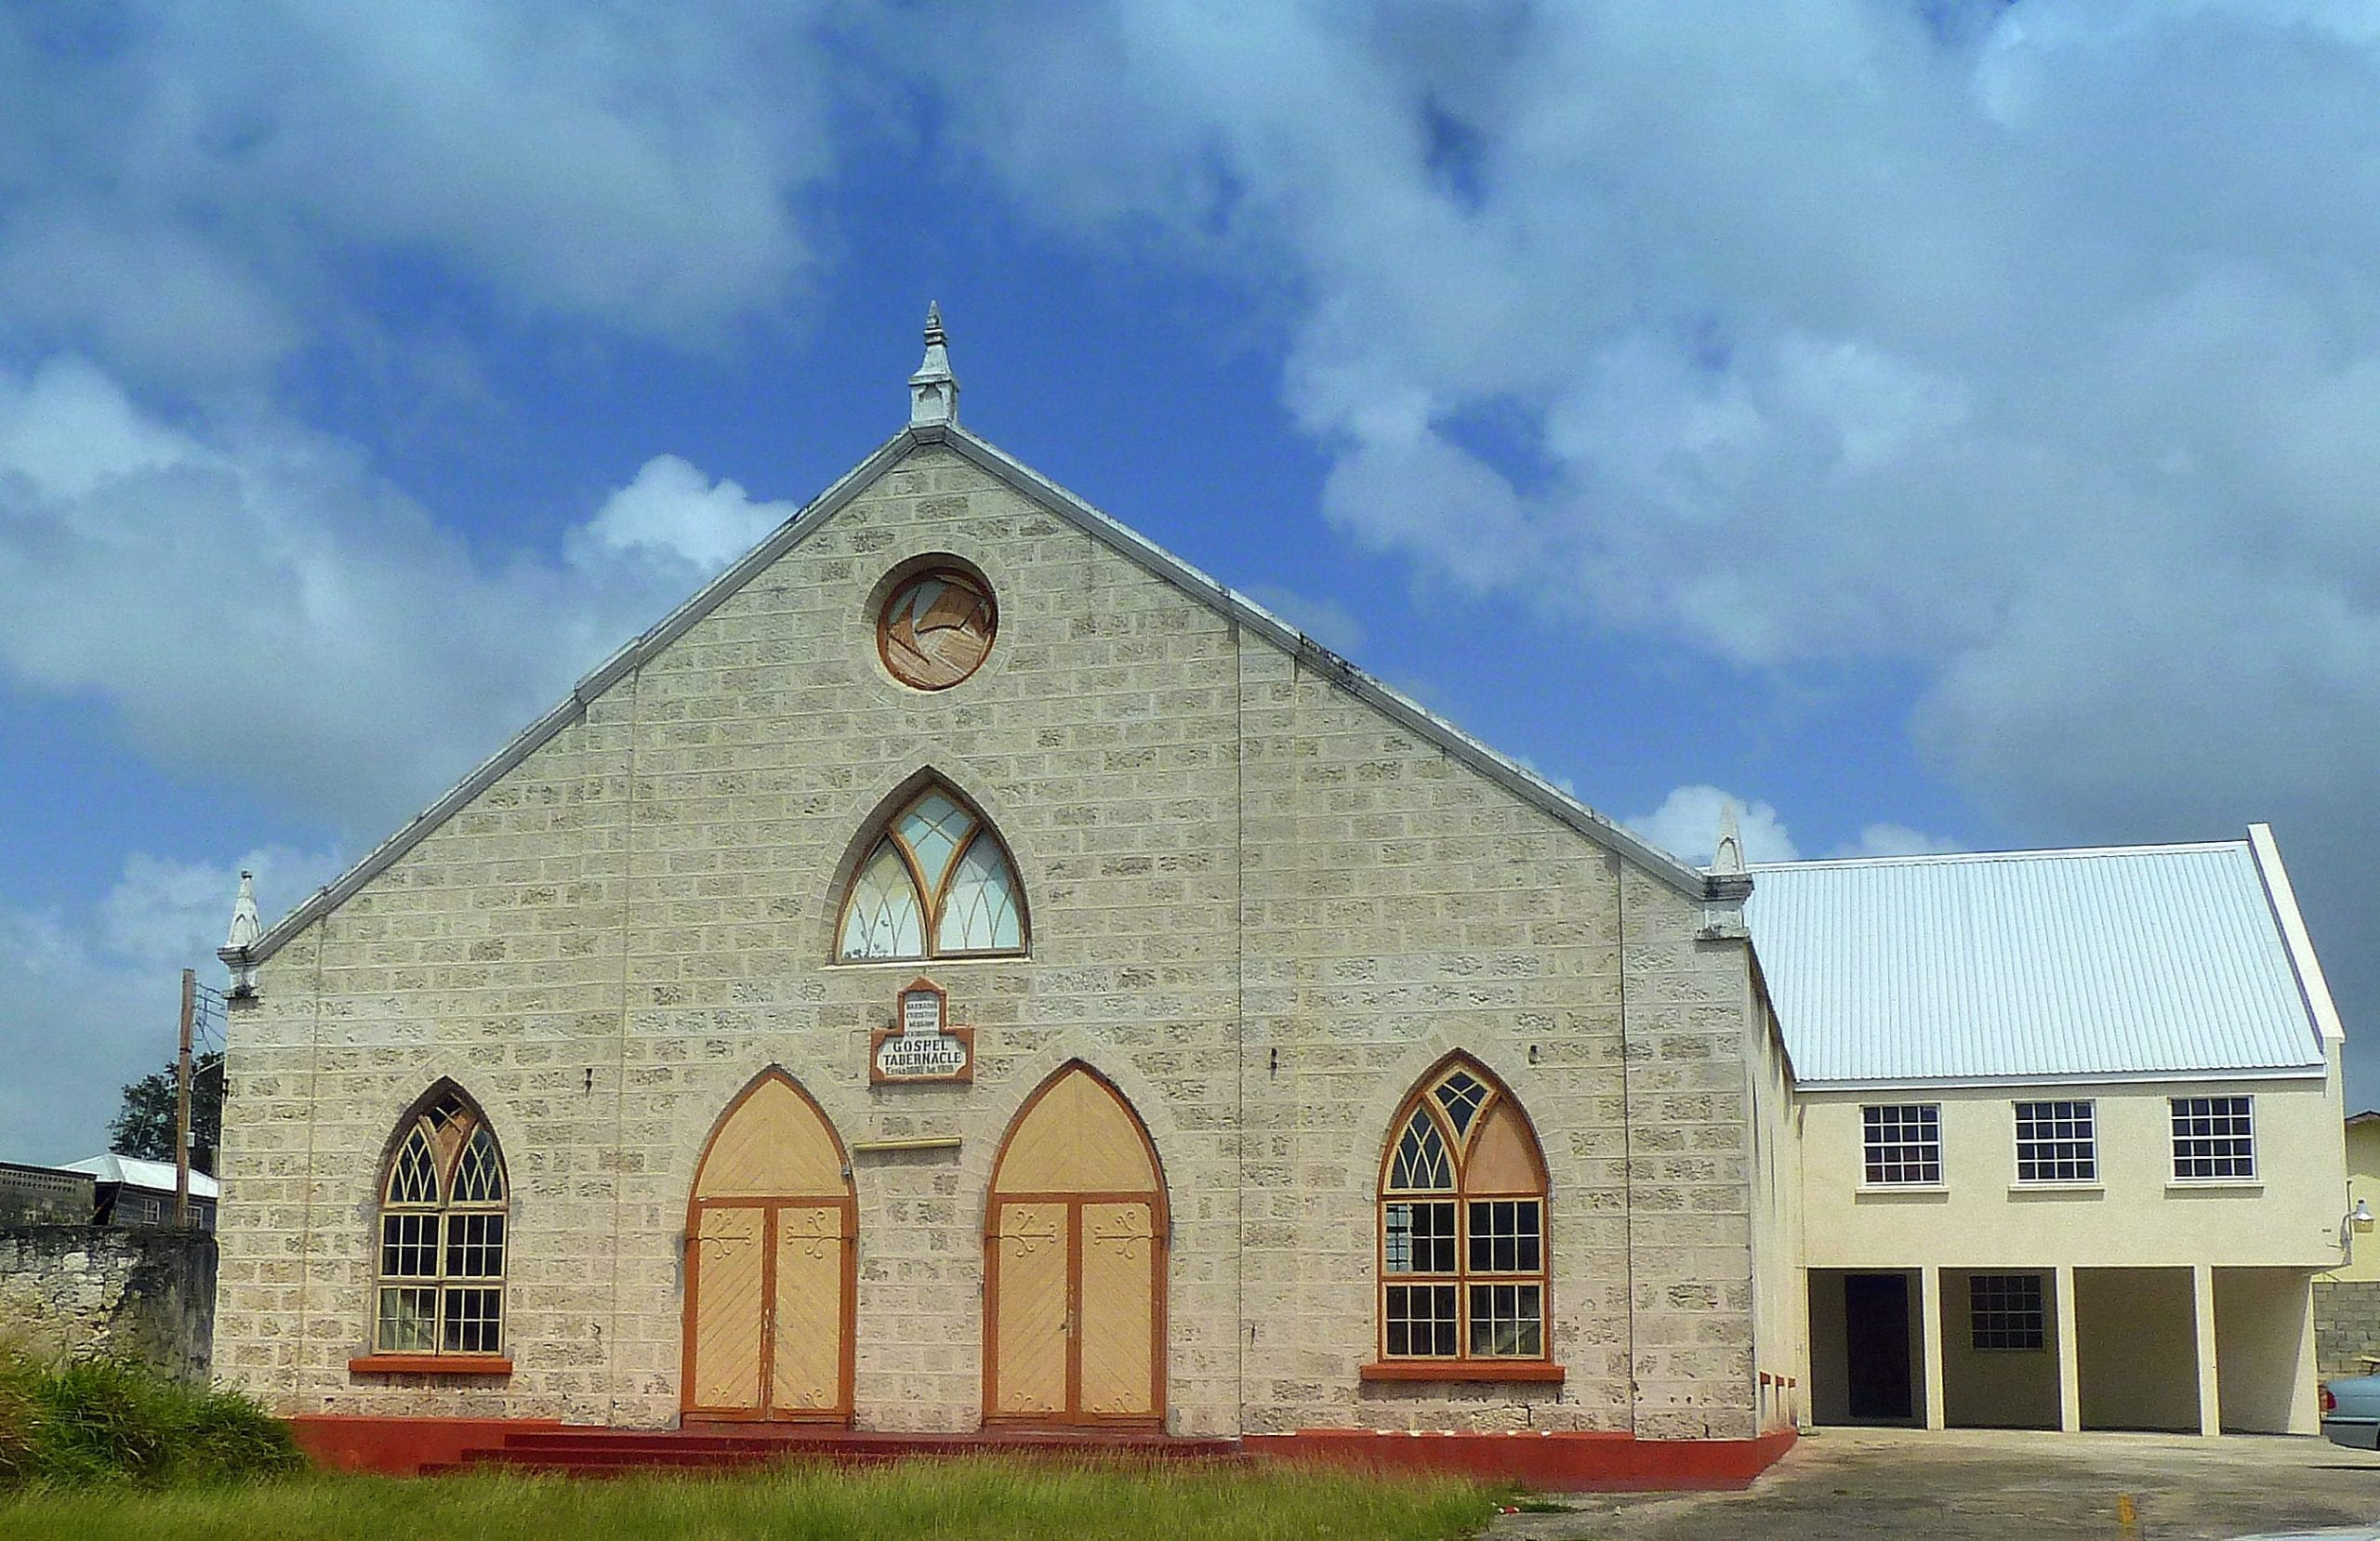 Christian Mission Gospel Tabernacle